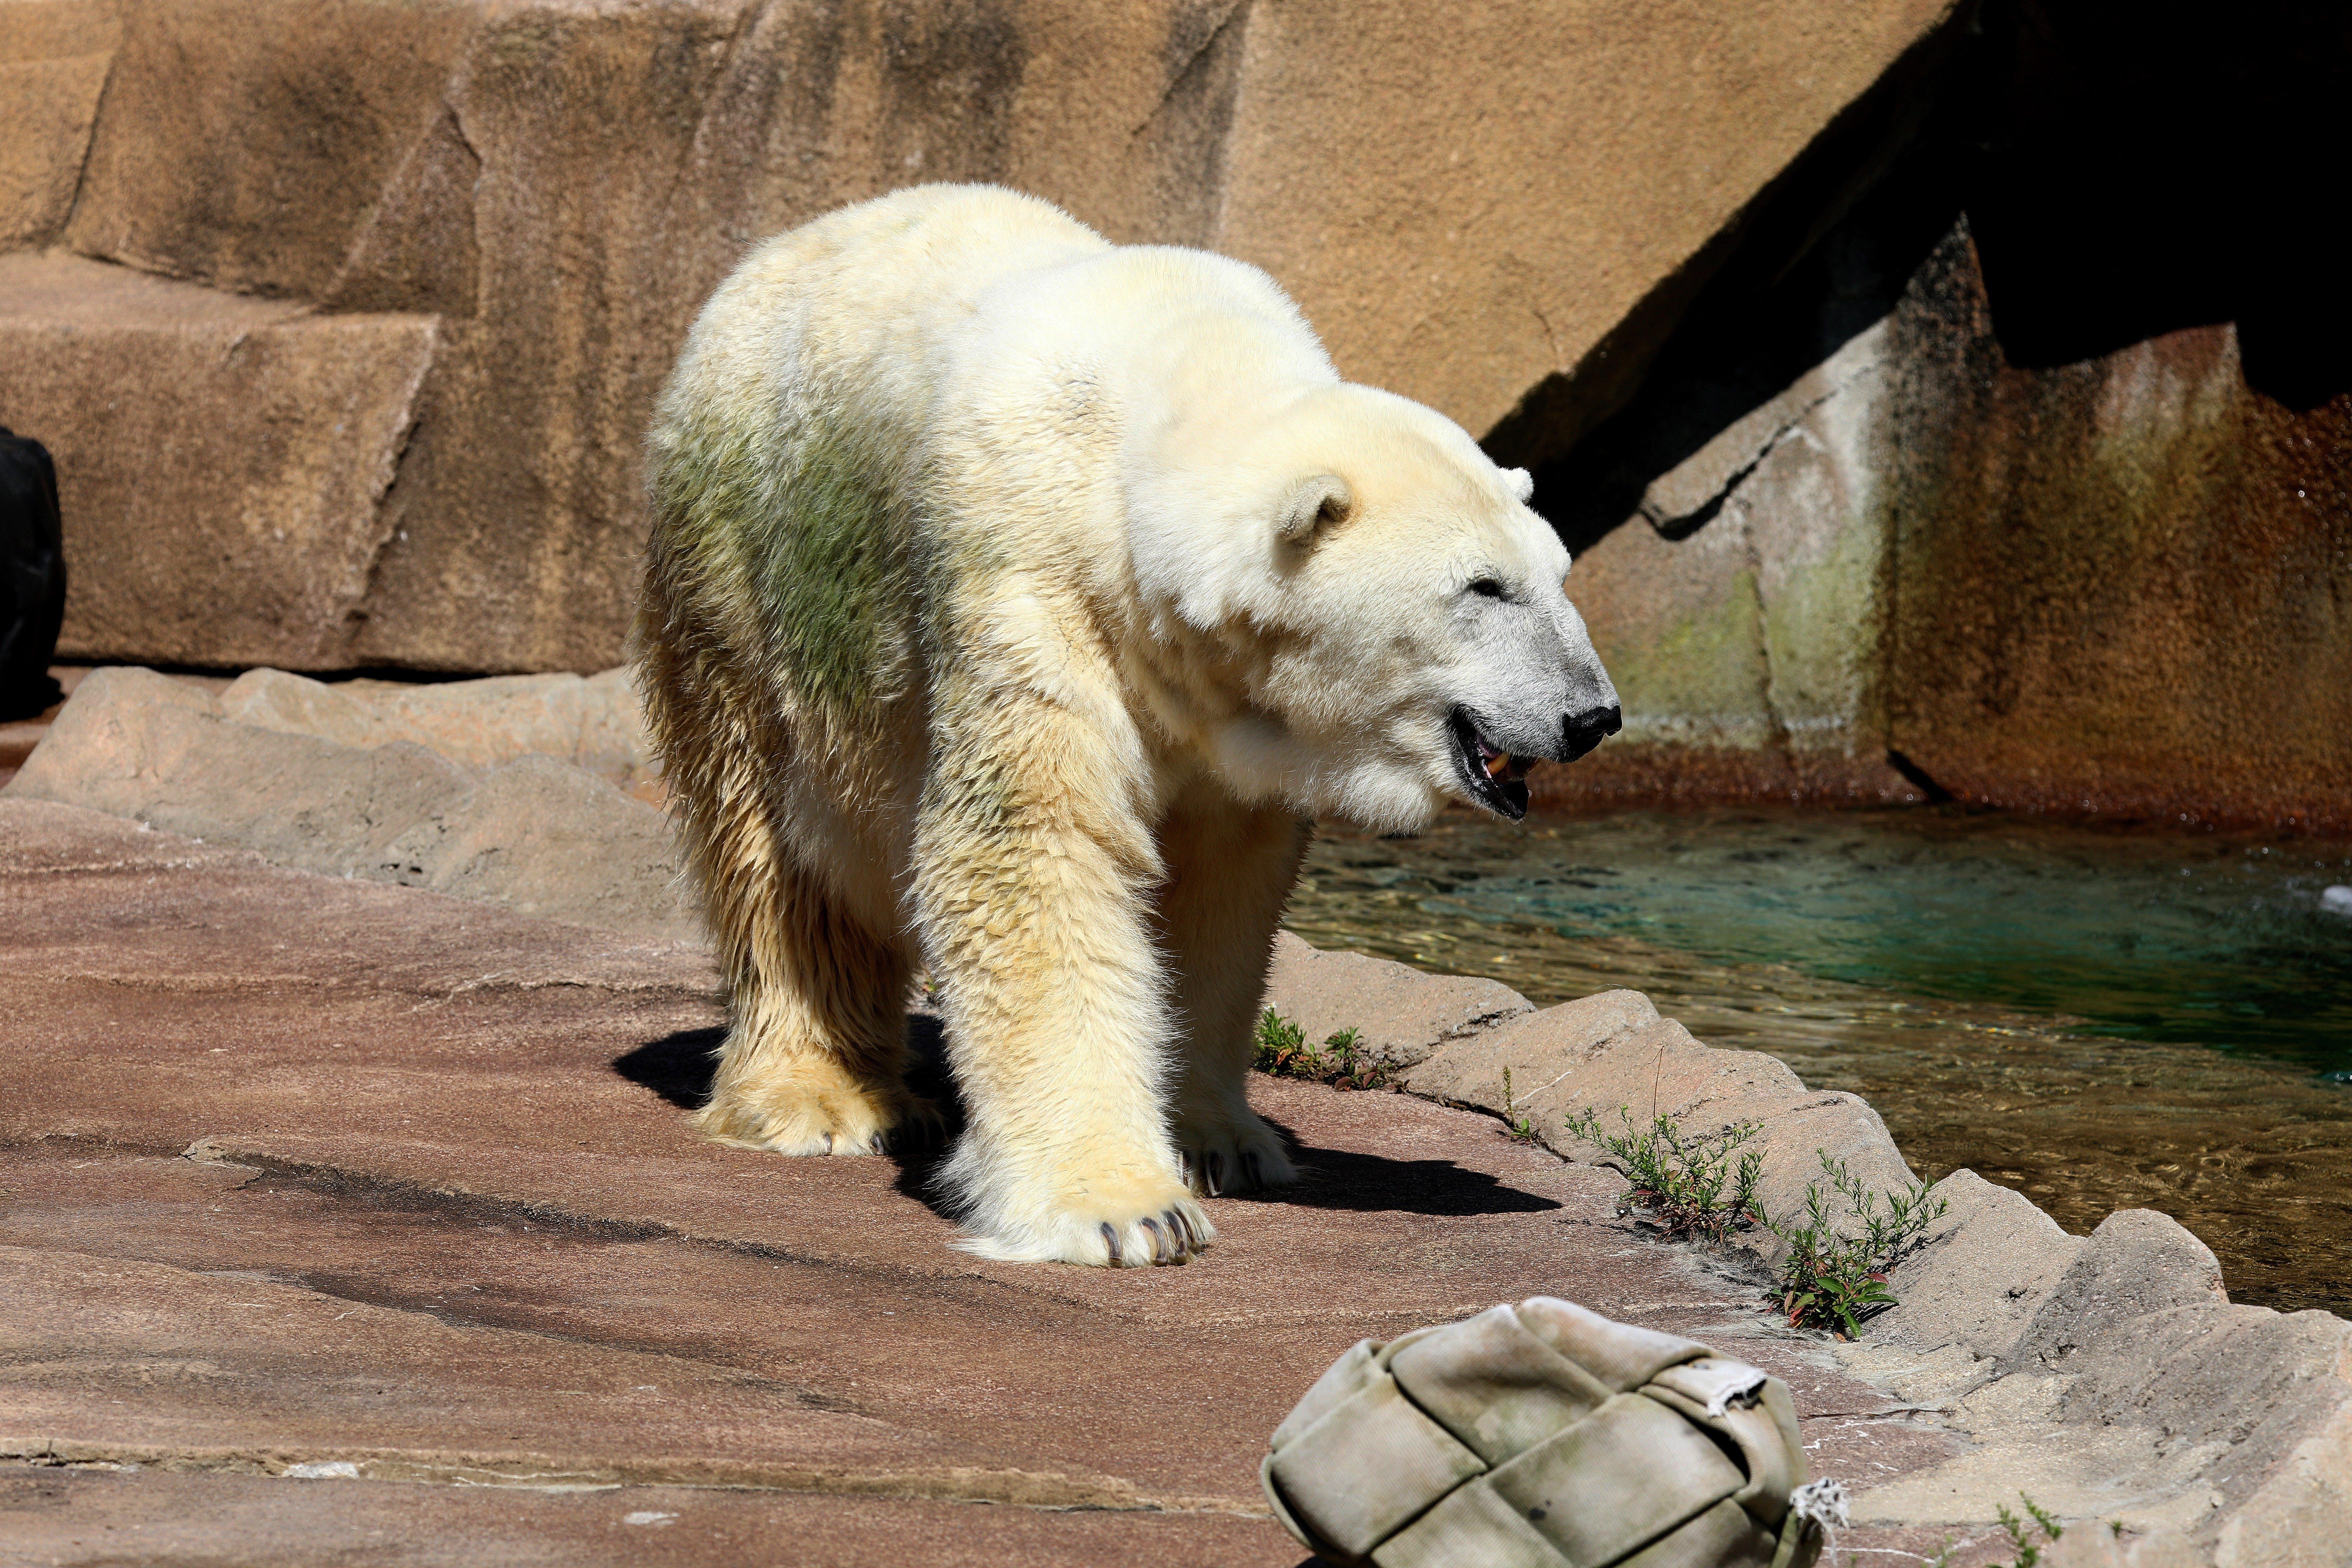 Polar Bear at the Milwaukee County Zo